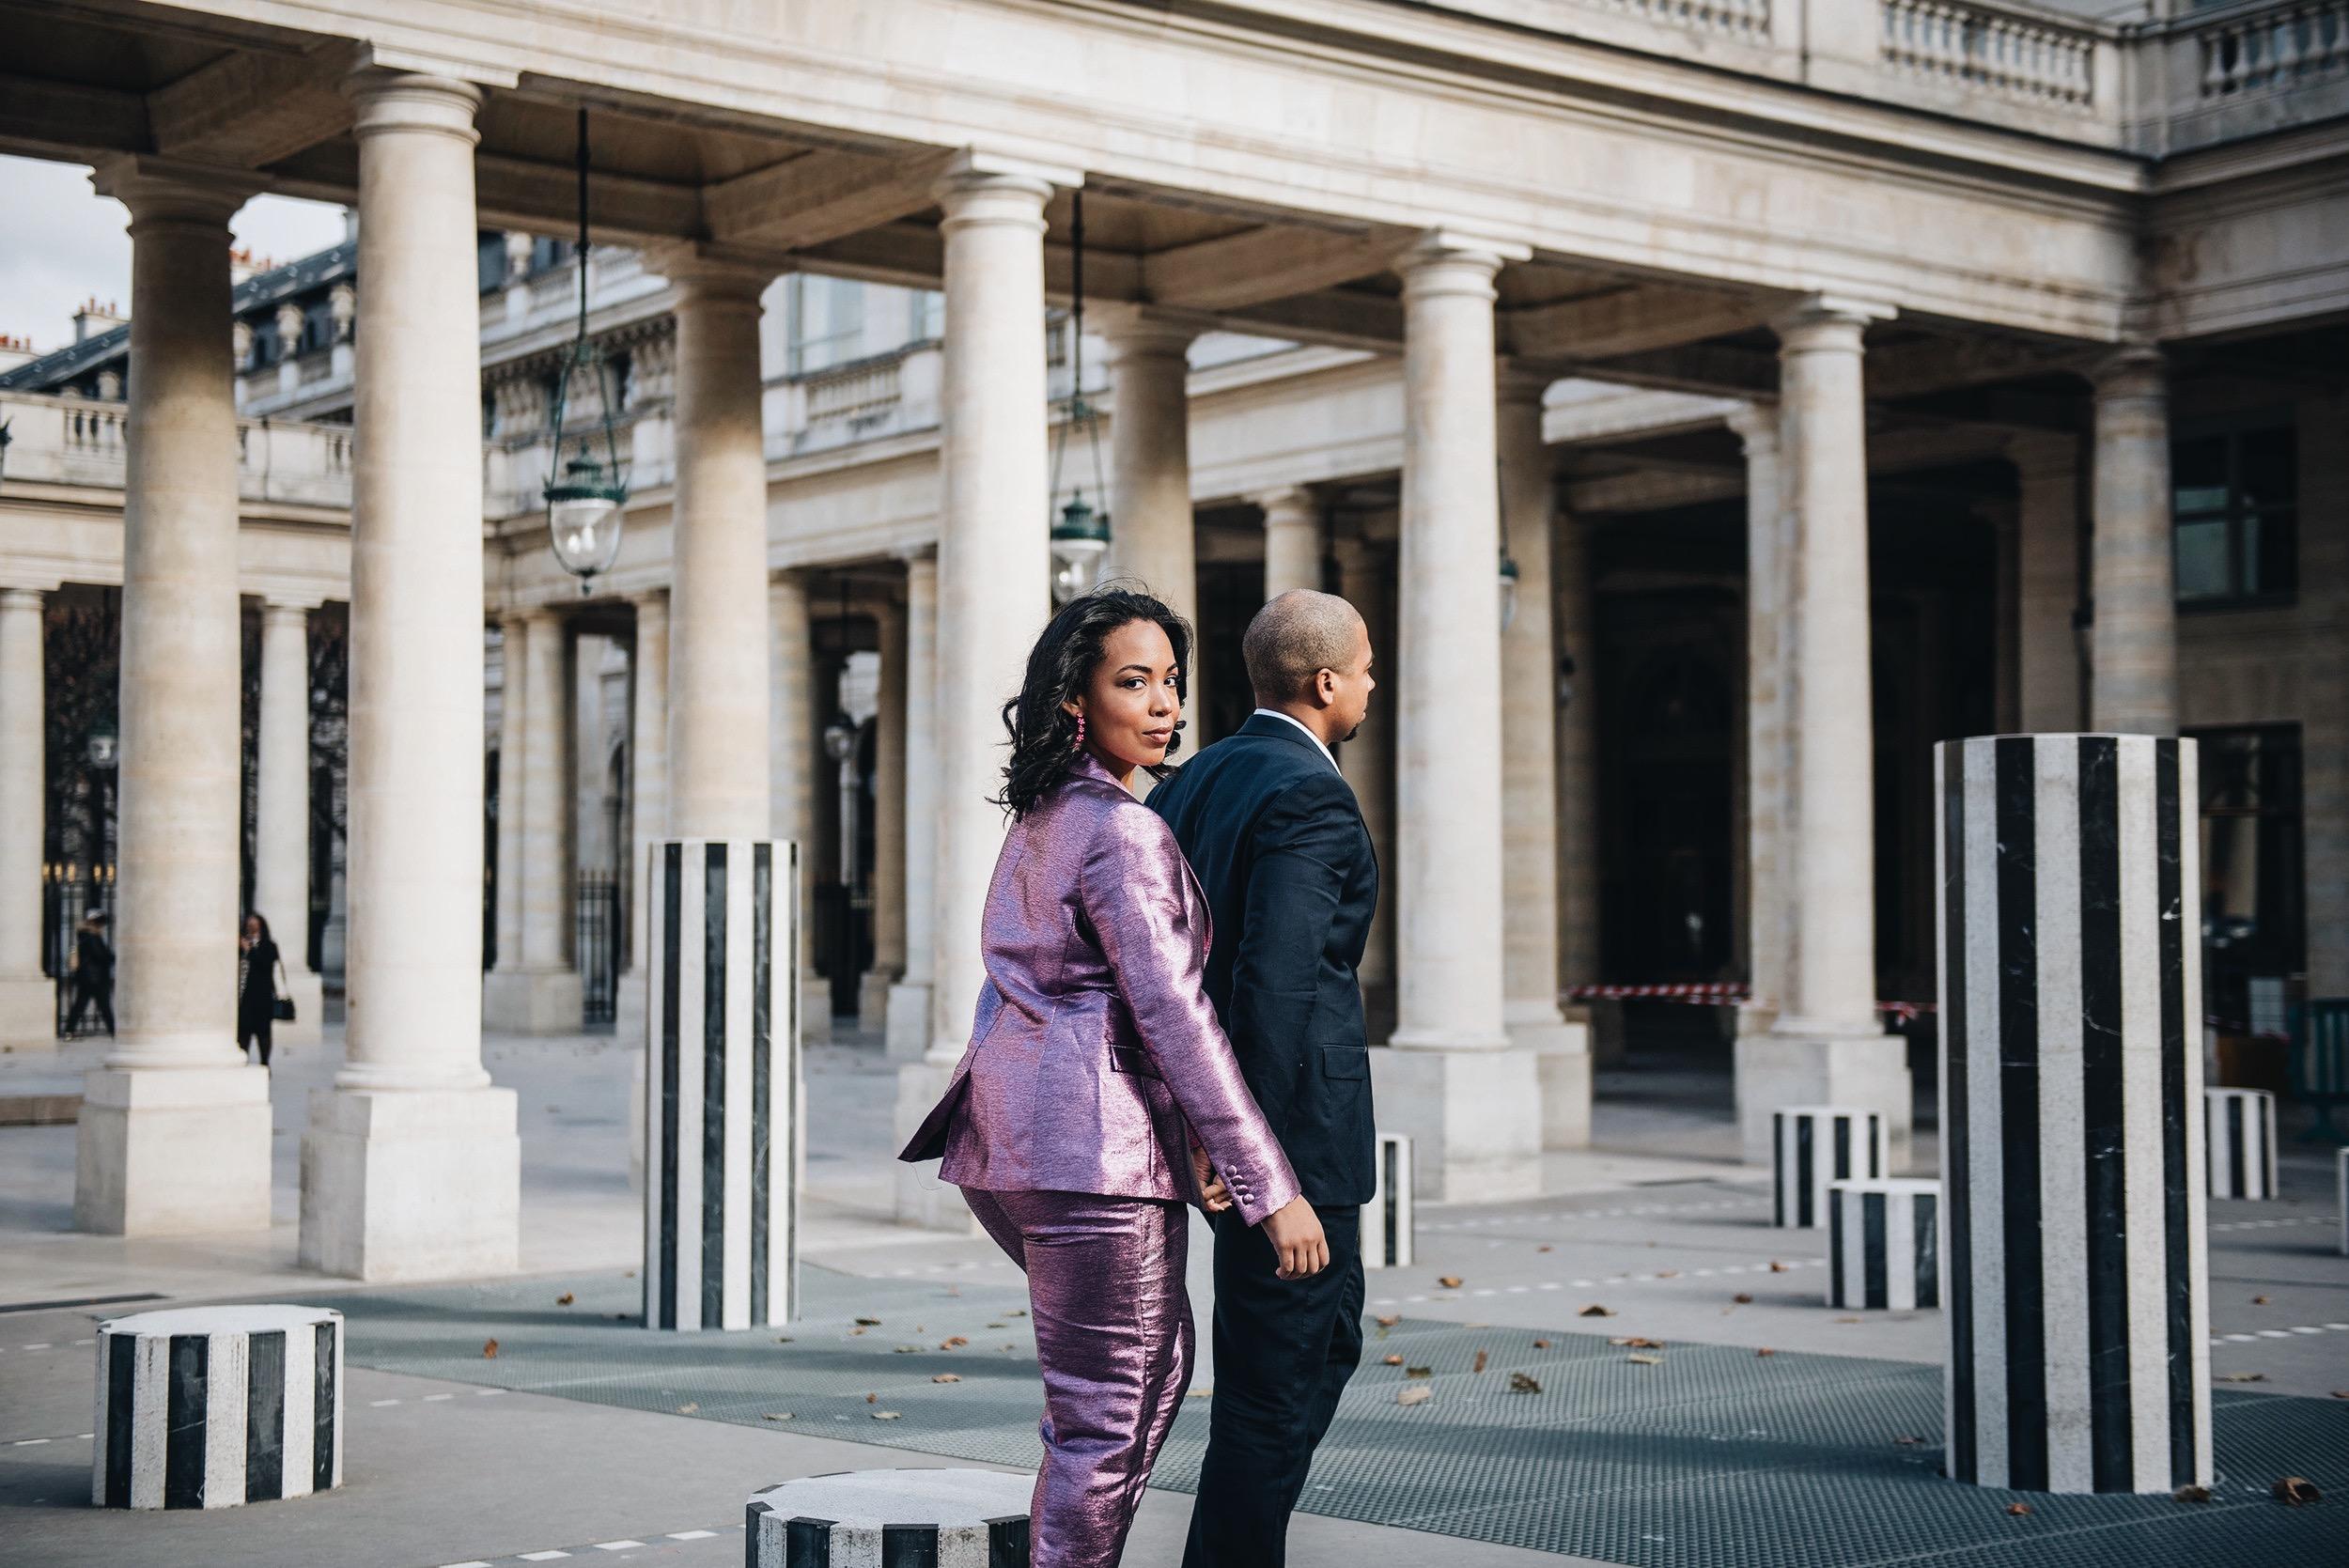 ASOS-Metallic-pink-suit-asos-court-shoe-jcrew-embellished-resin-hoops-mens-wearhouse-navy-suit-3.JPG